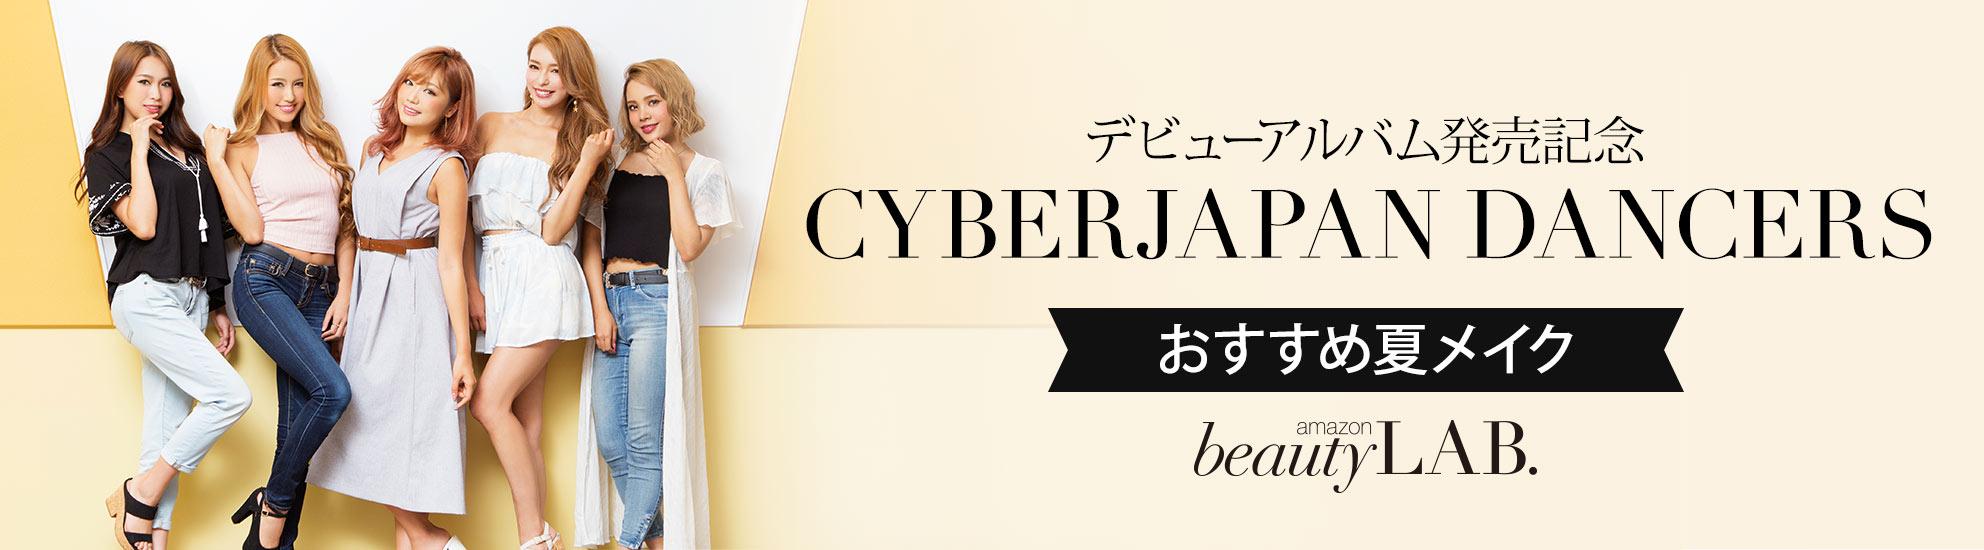 """CYBERJAPAN DANCERS""デビューアルバム発売決定記念"